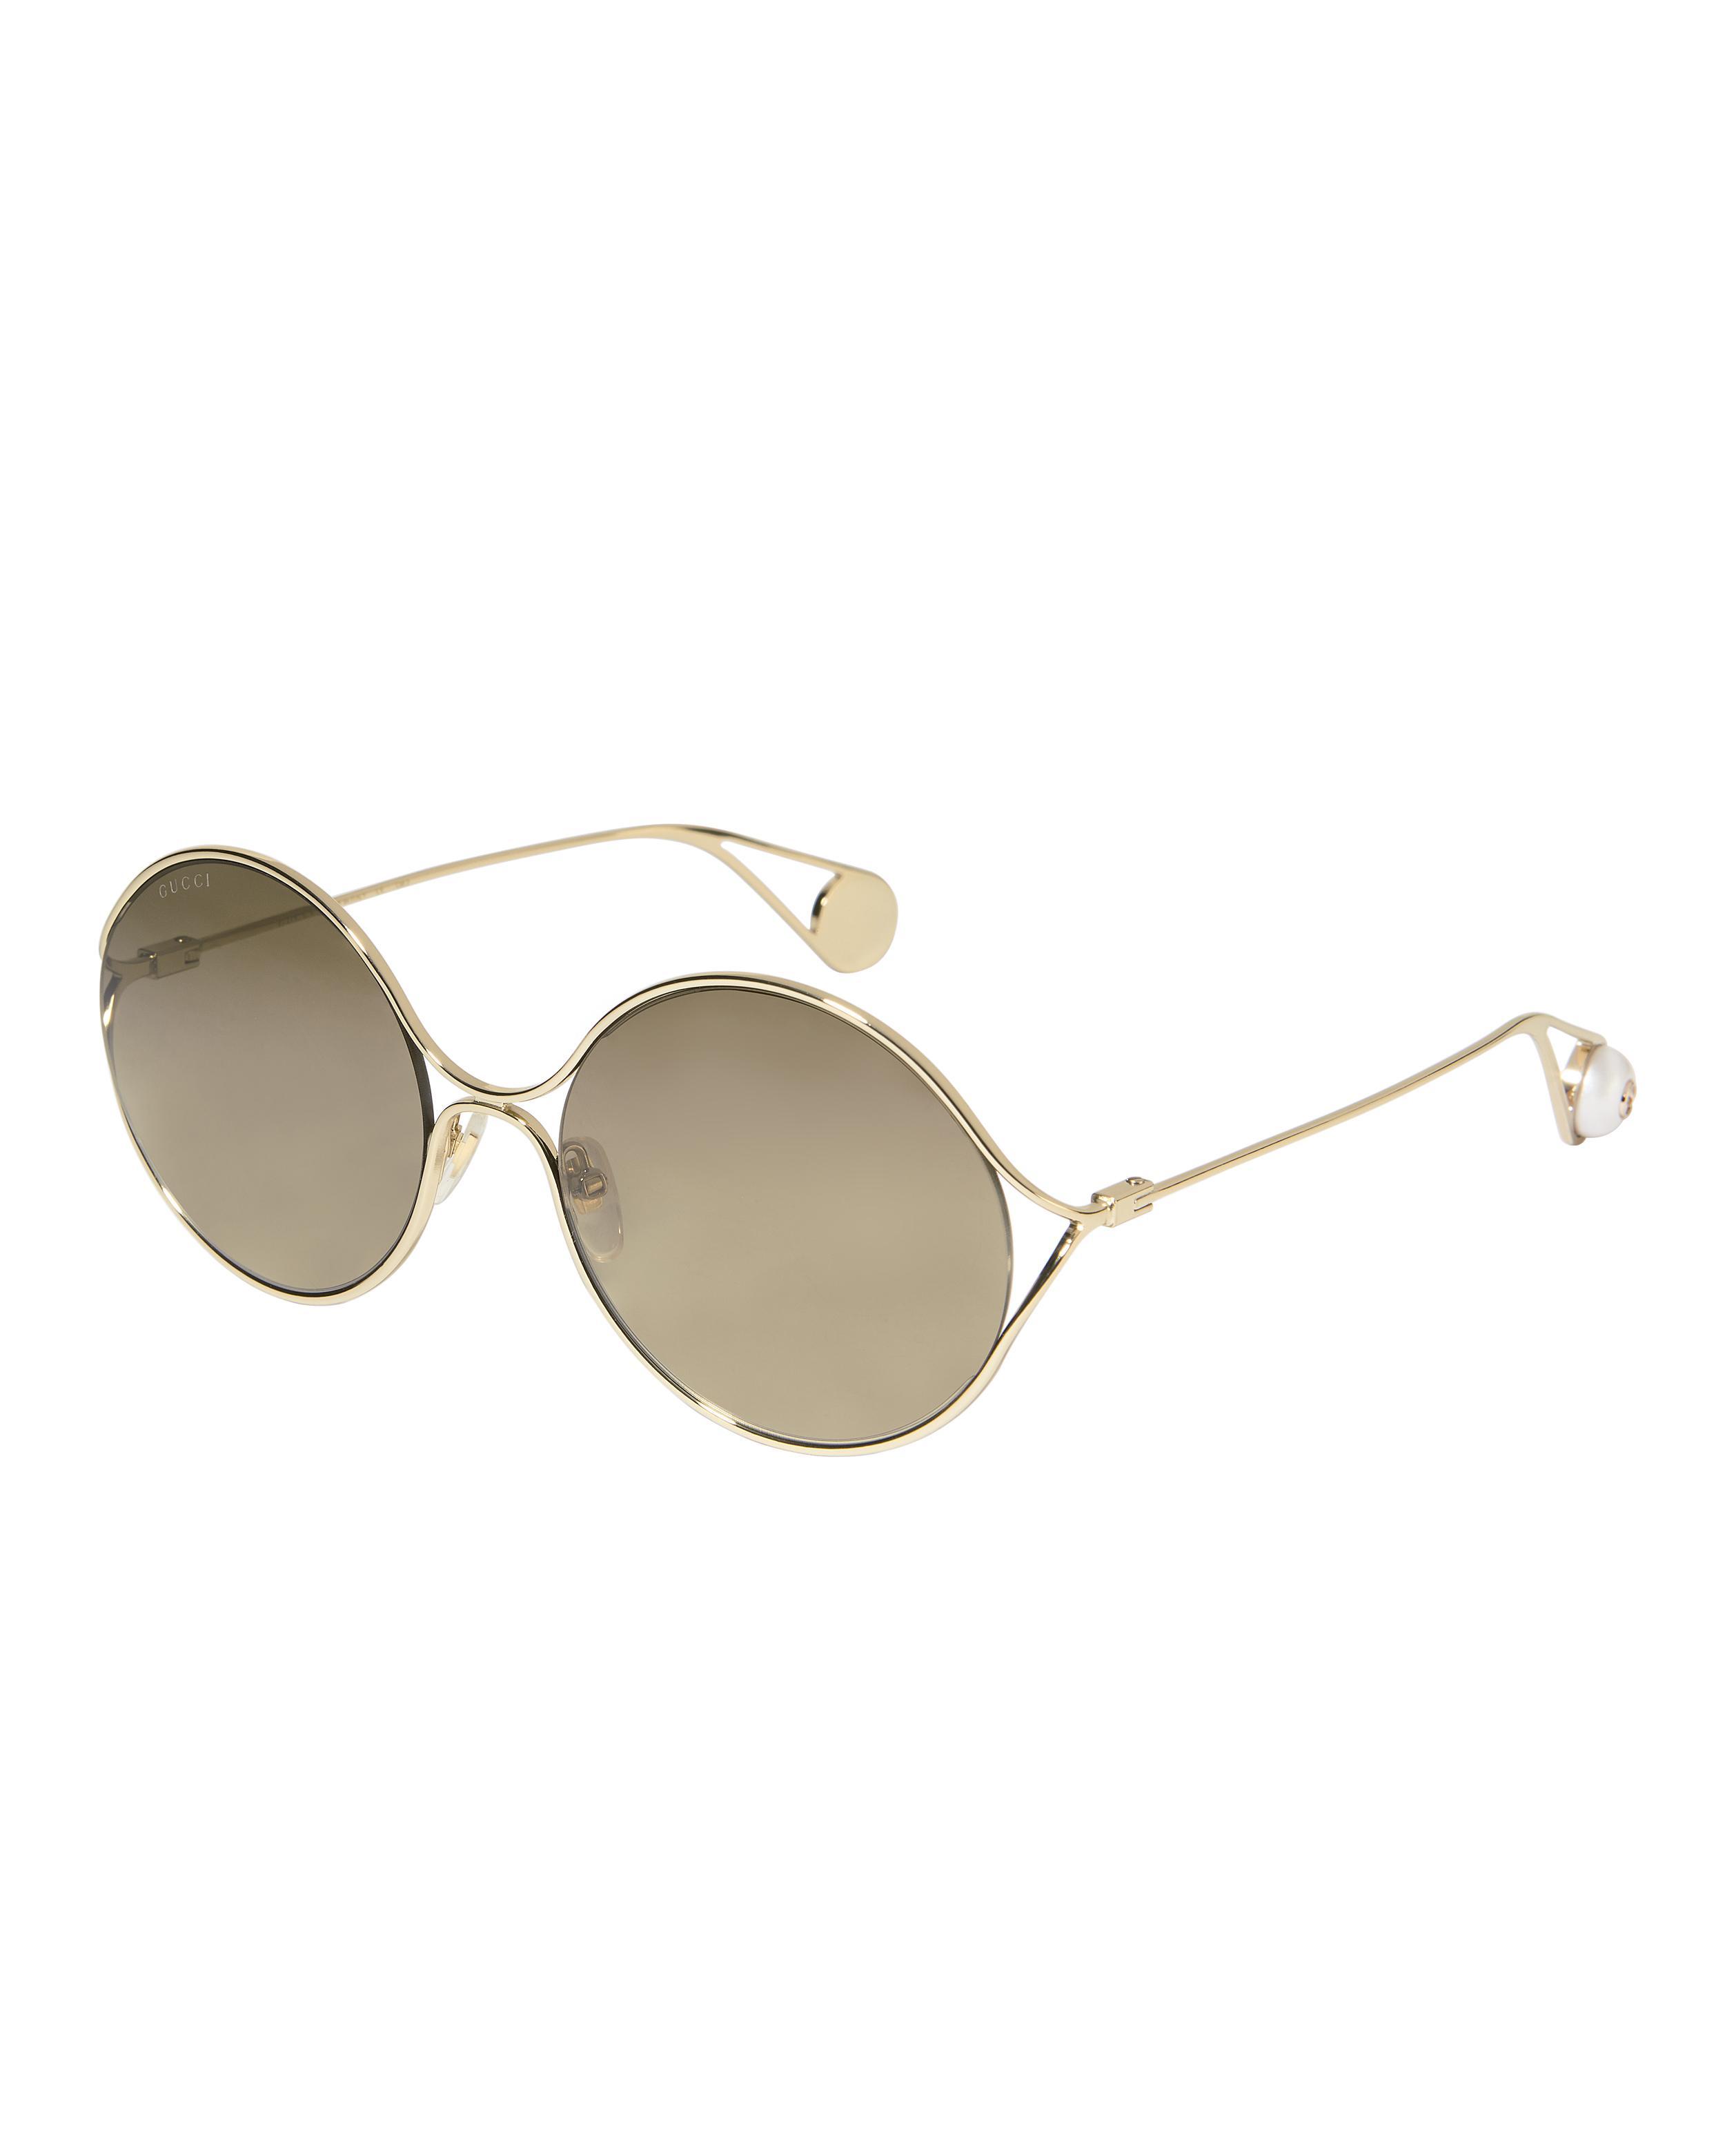 ffb7ce468b8 Lyst - Gucci Oval Metal Sunglasses in Metallic